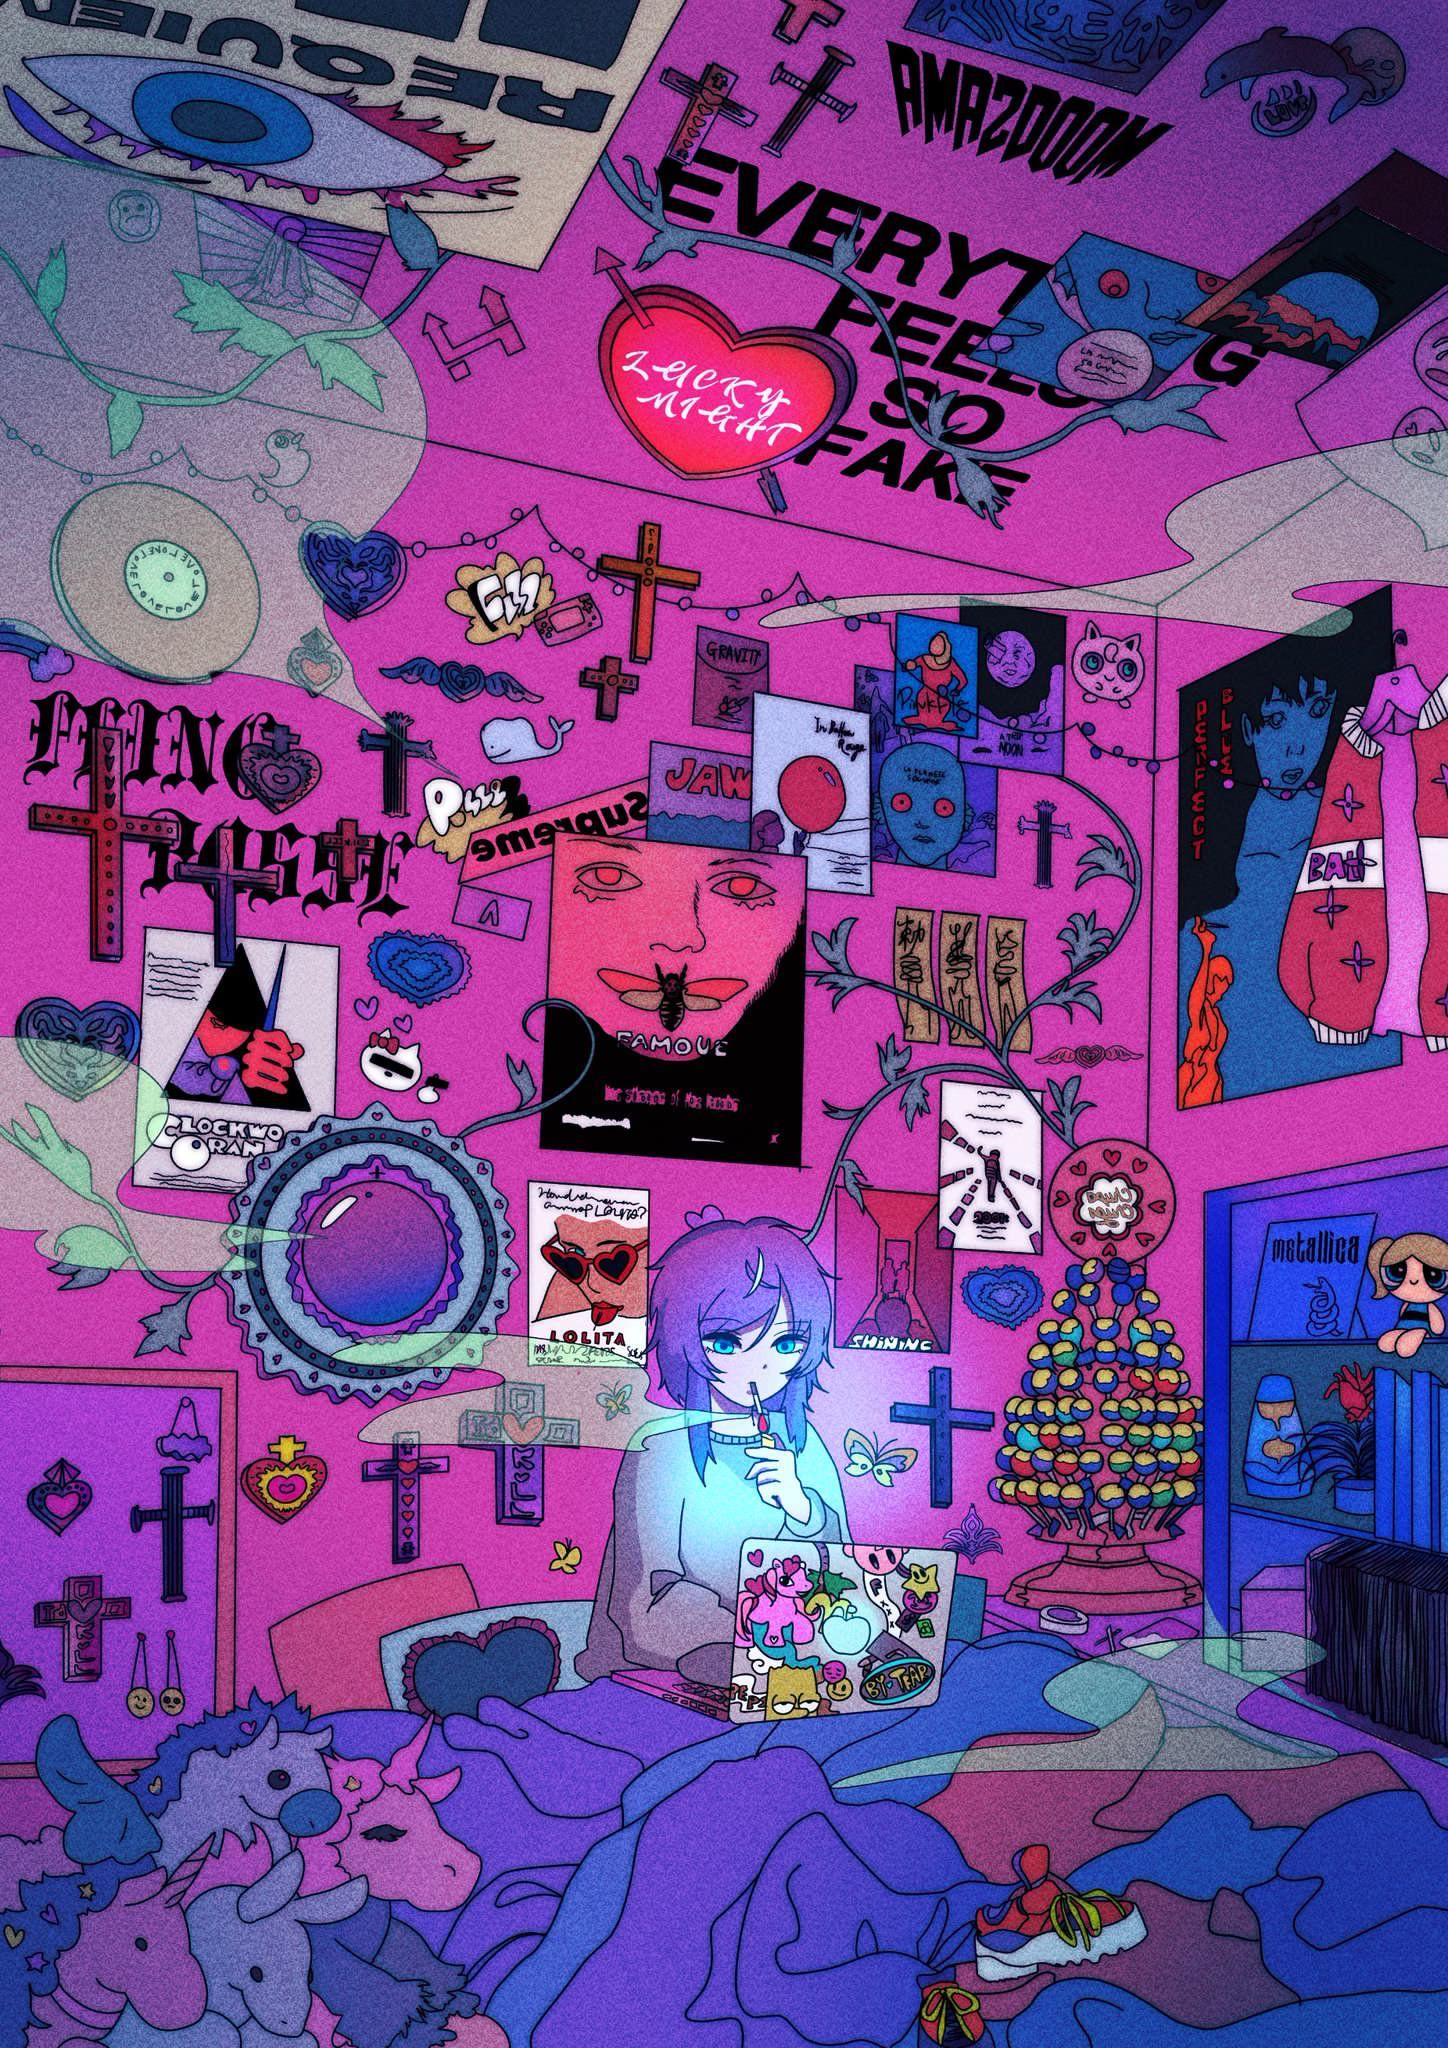 Division All Stars Ã'プノシスマイク Matenrou Hypnosis Mic Hypmic Ã'プマイ Anime Music Rap Japanese Anime Wall Art Kawaii Art Anime Art Girl